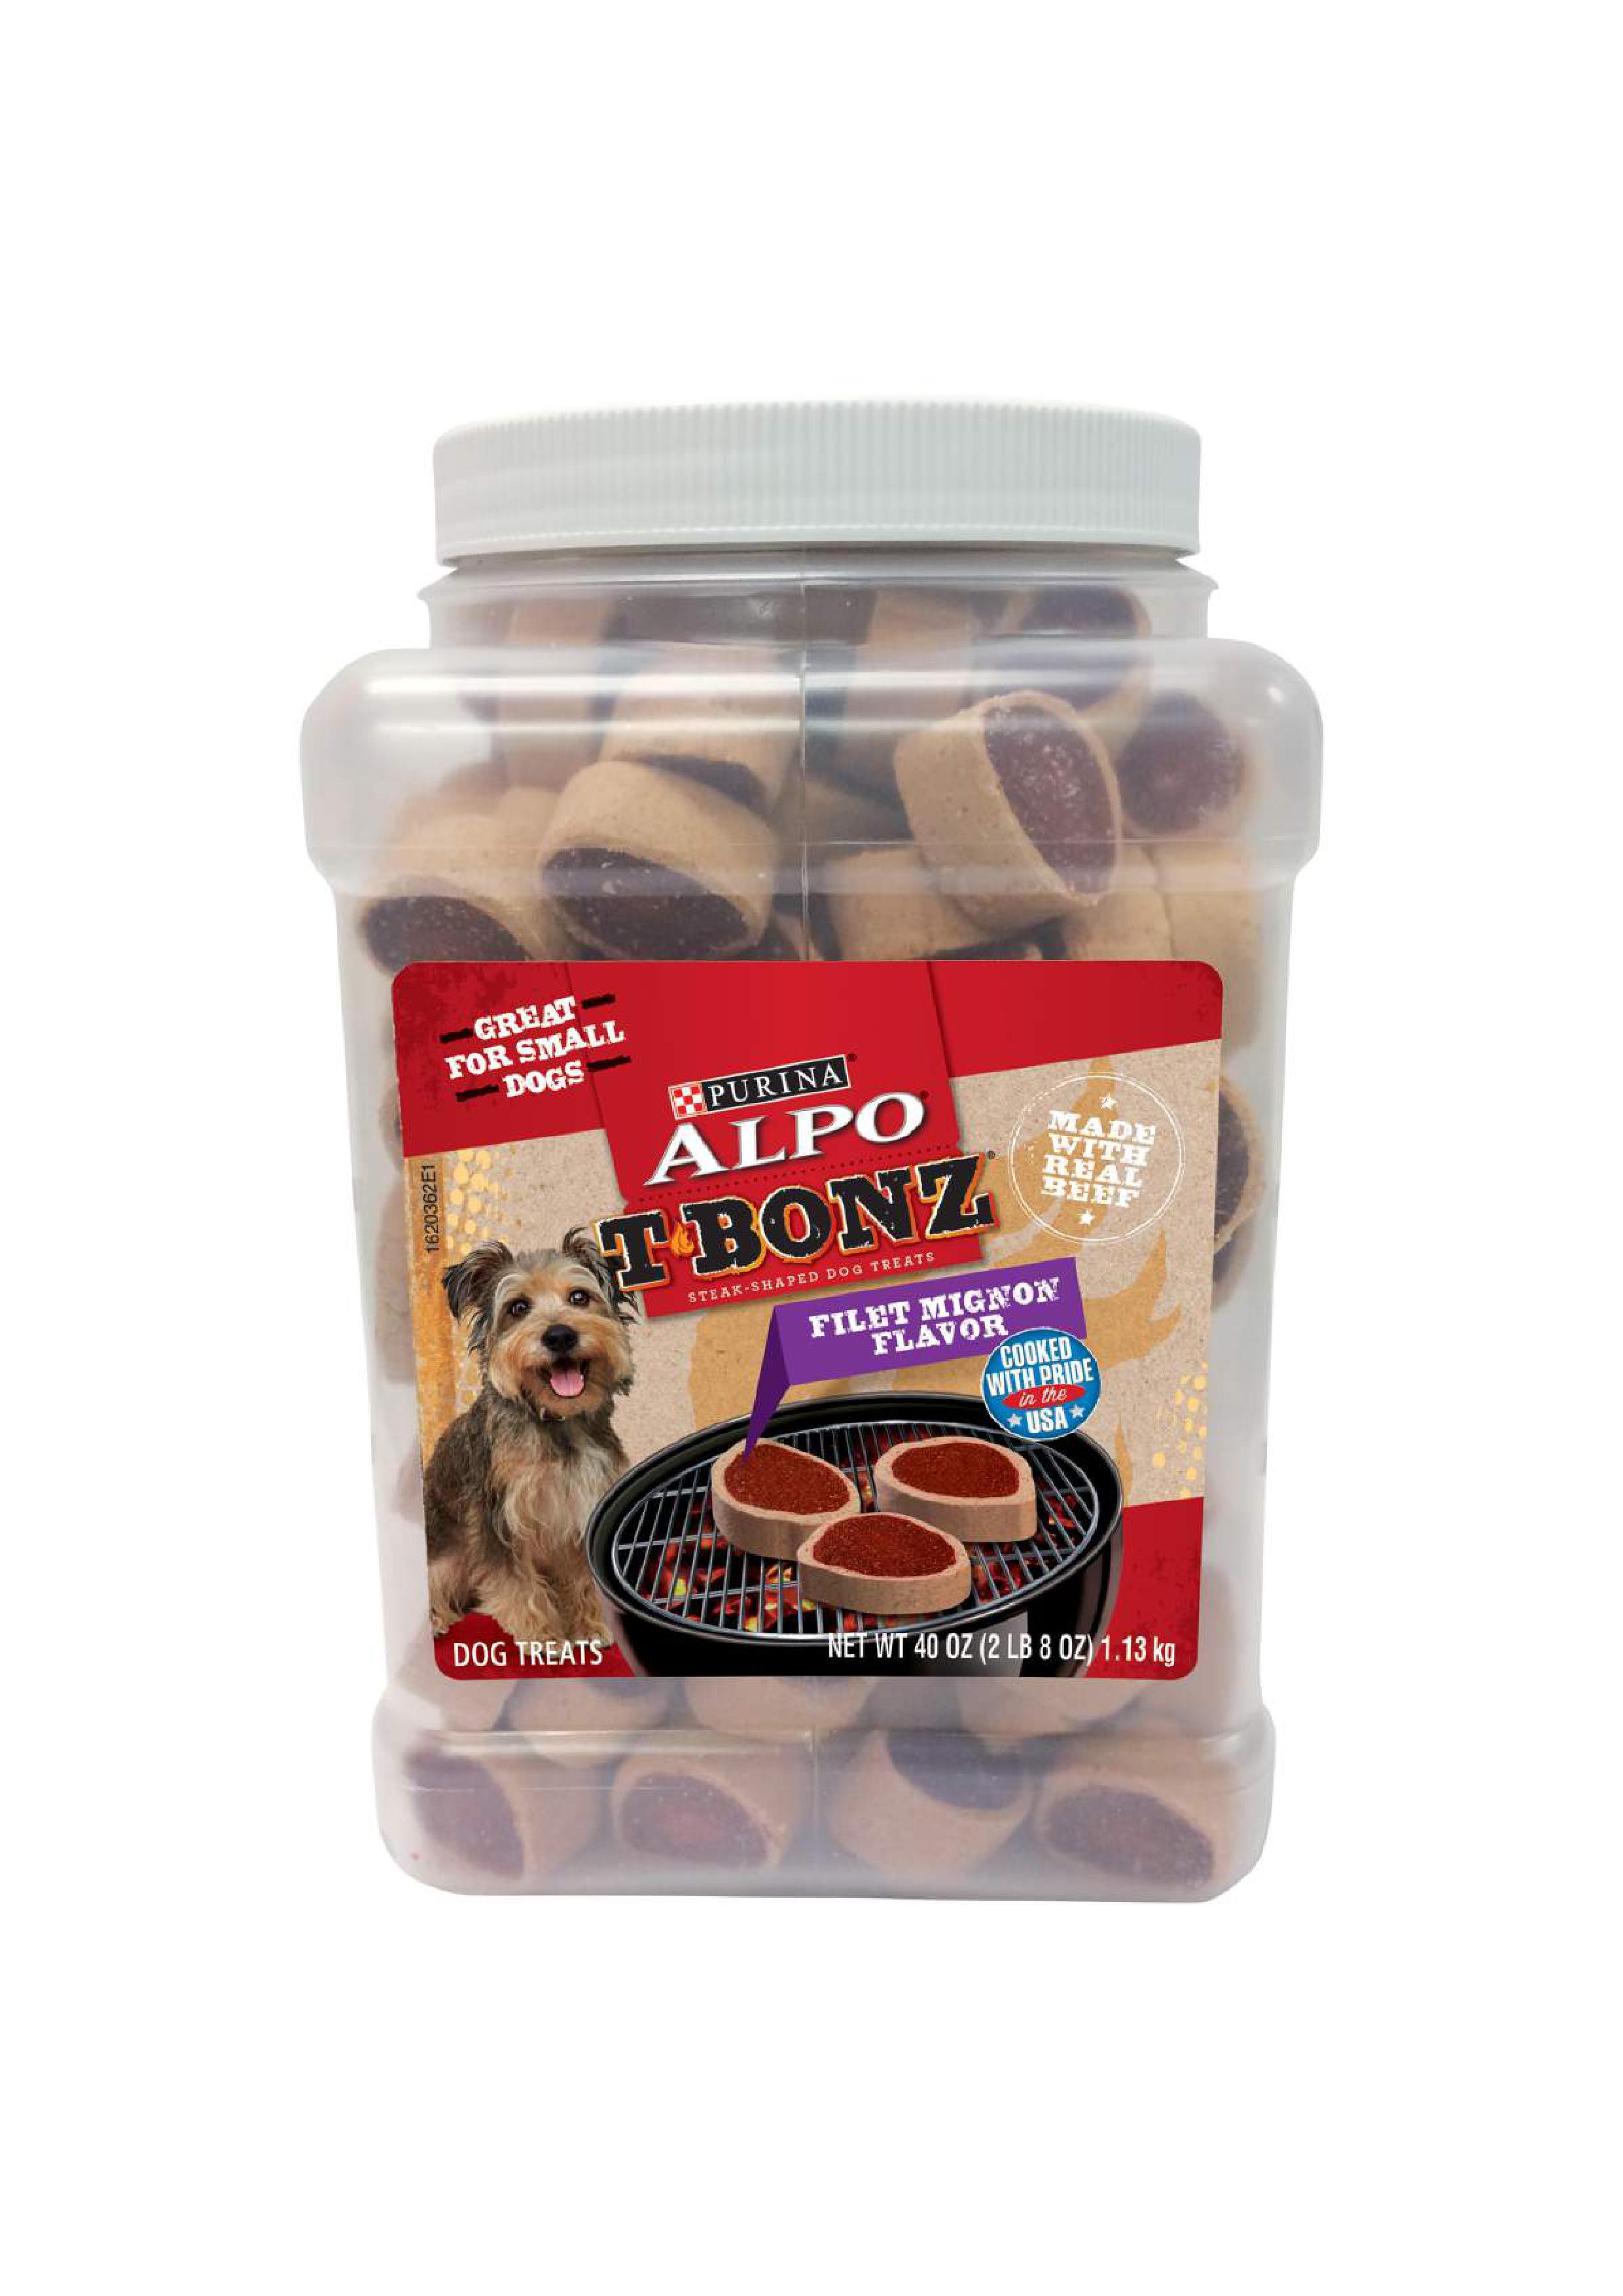 Purina ALPO T-Bonz Filet Mignon Flavor 1.13kg